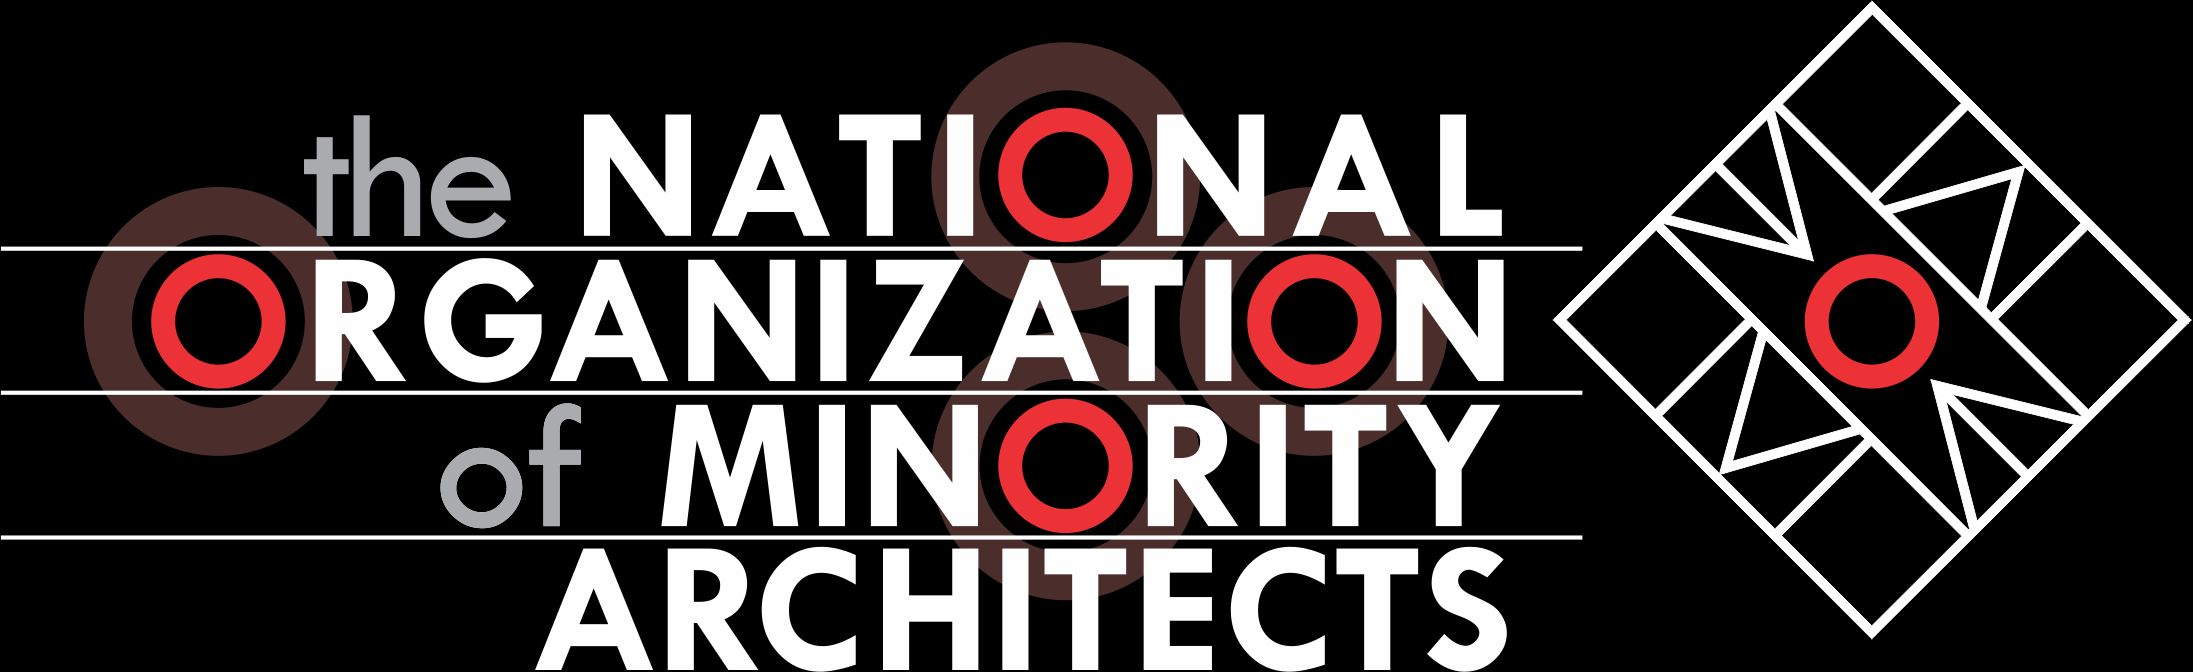 Home Page | National Organization of Minority Architects - NOMA